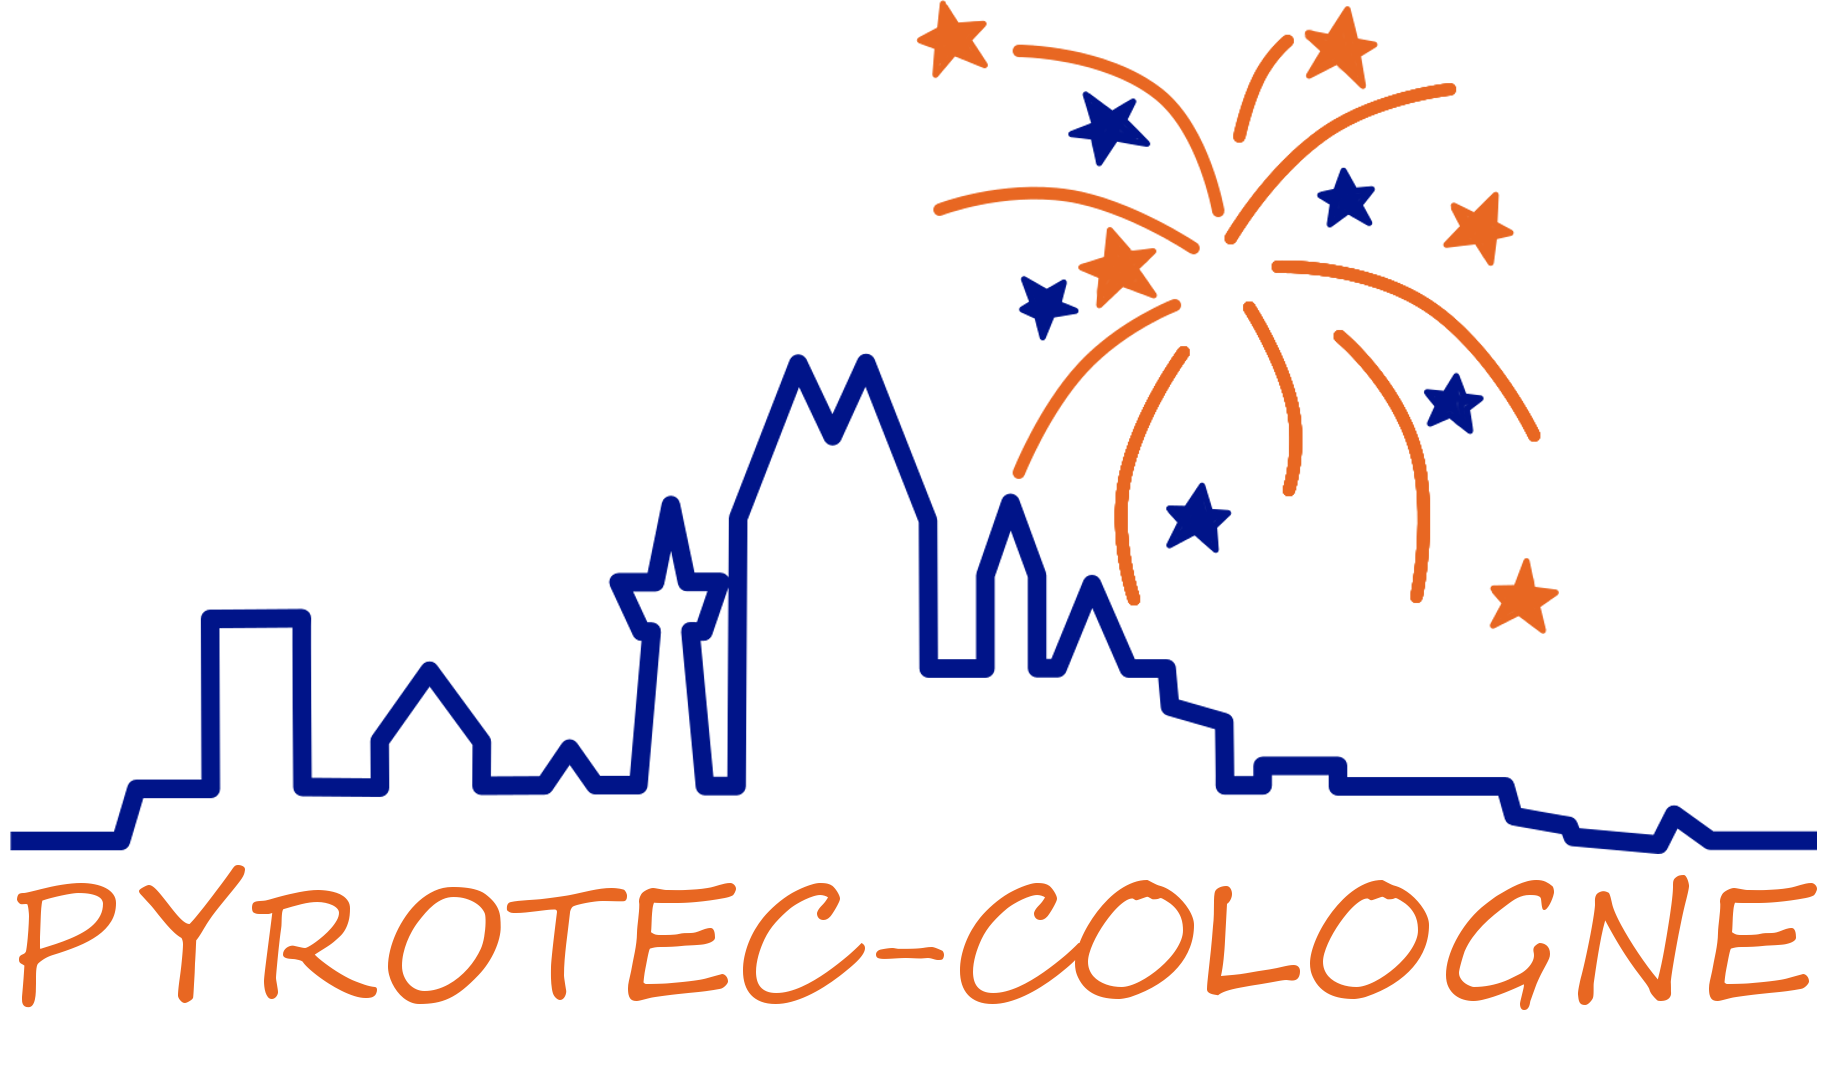 Pyrotec- Cologne